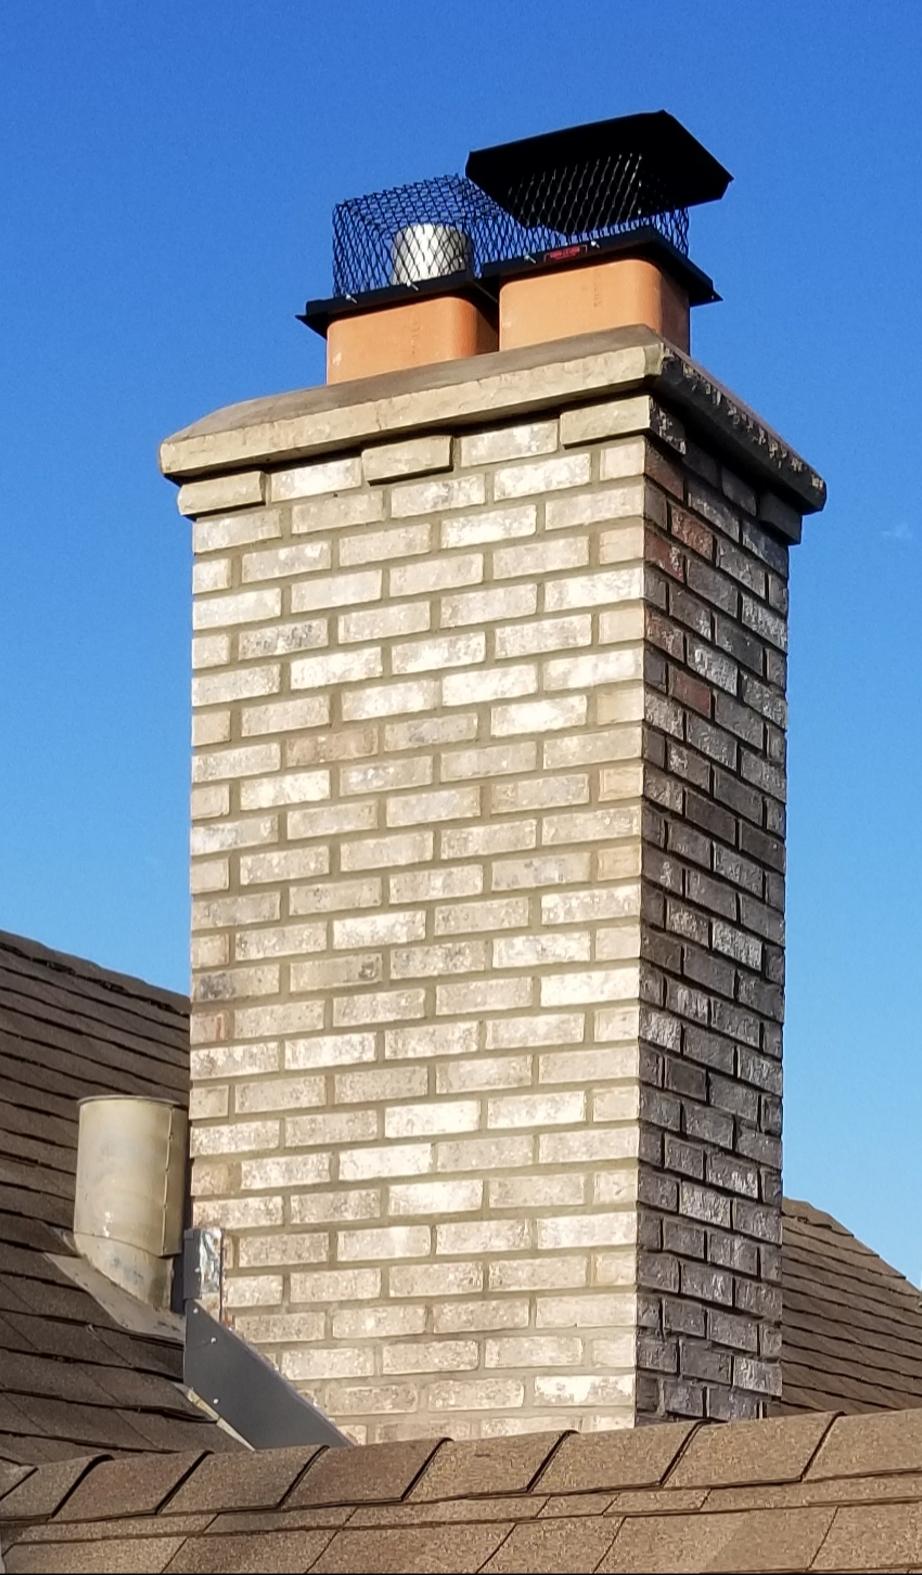 Brick Chimneys (25)